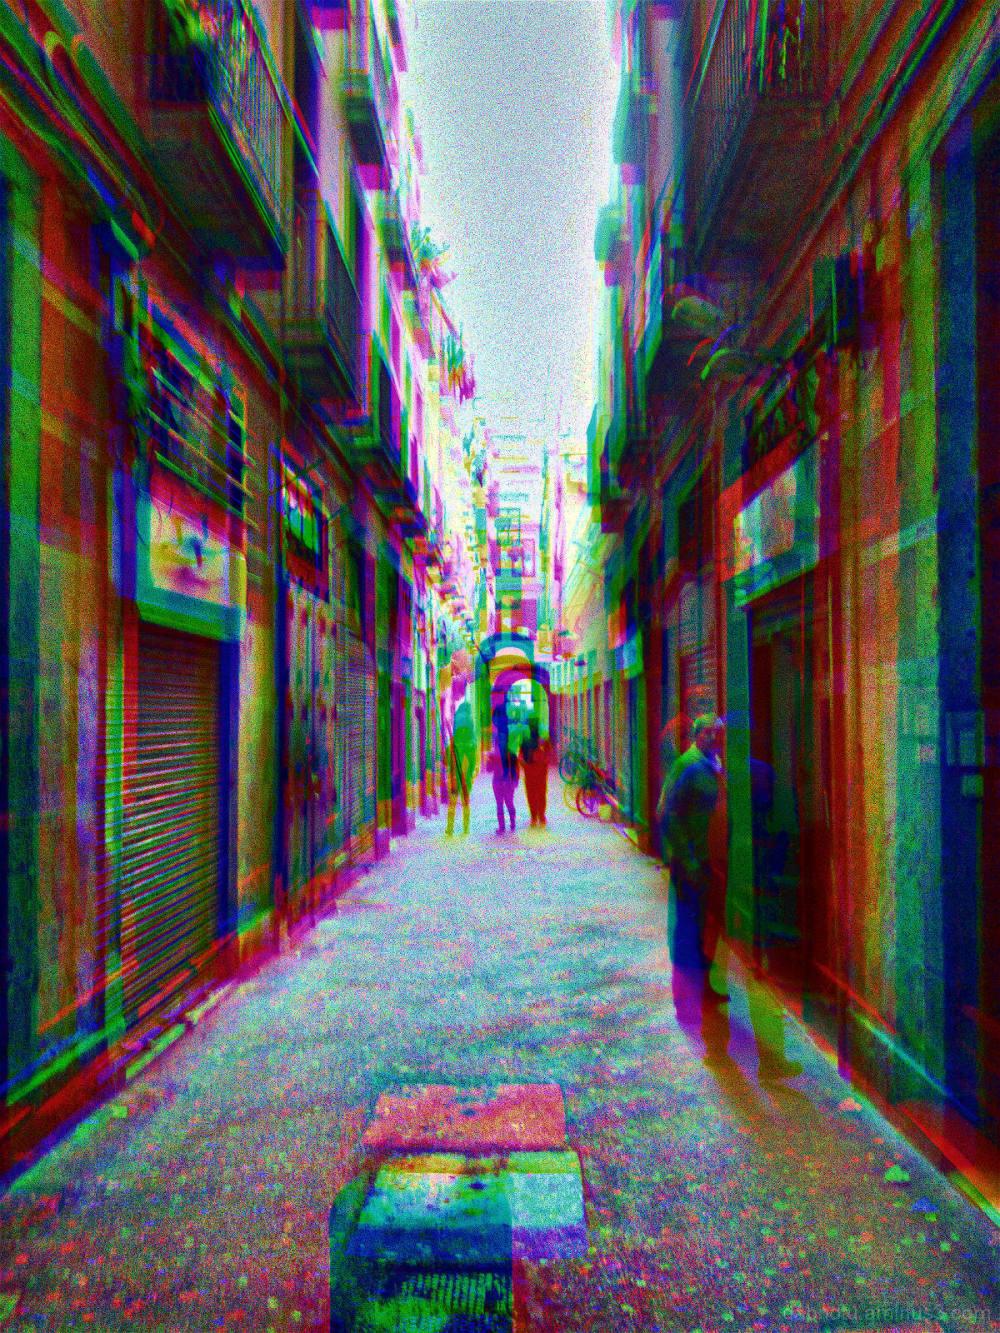 Barcelona street smartphonography, RGB, via GIMP.